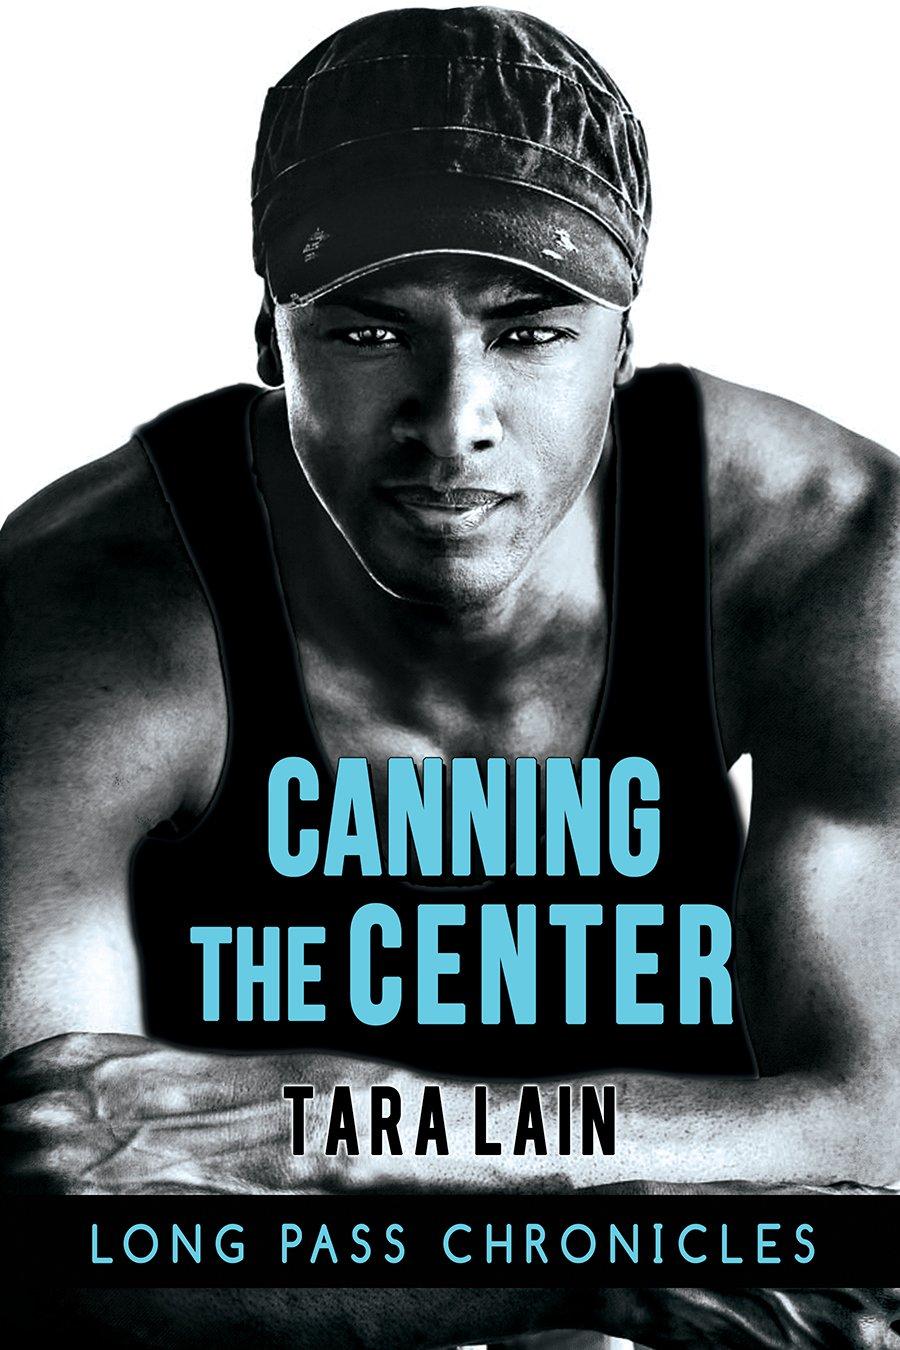 Long Pass Chronicles 2 - Canning the Center (M4B) - Tara Lain